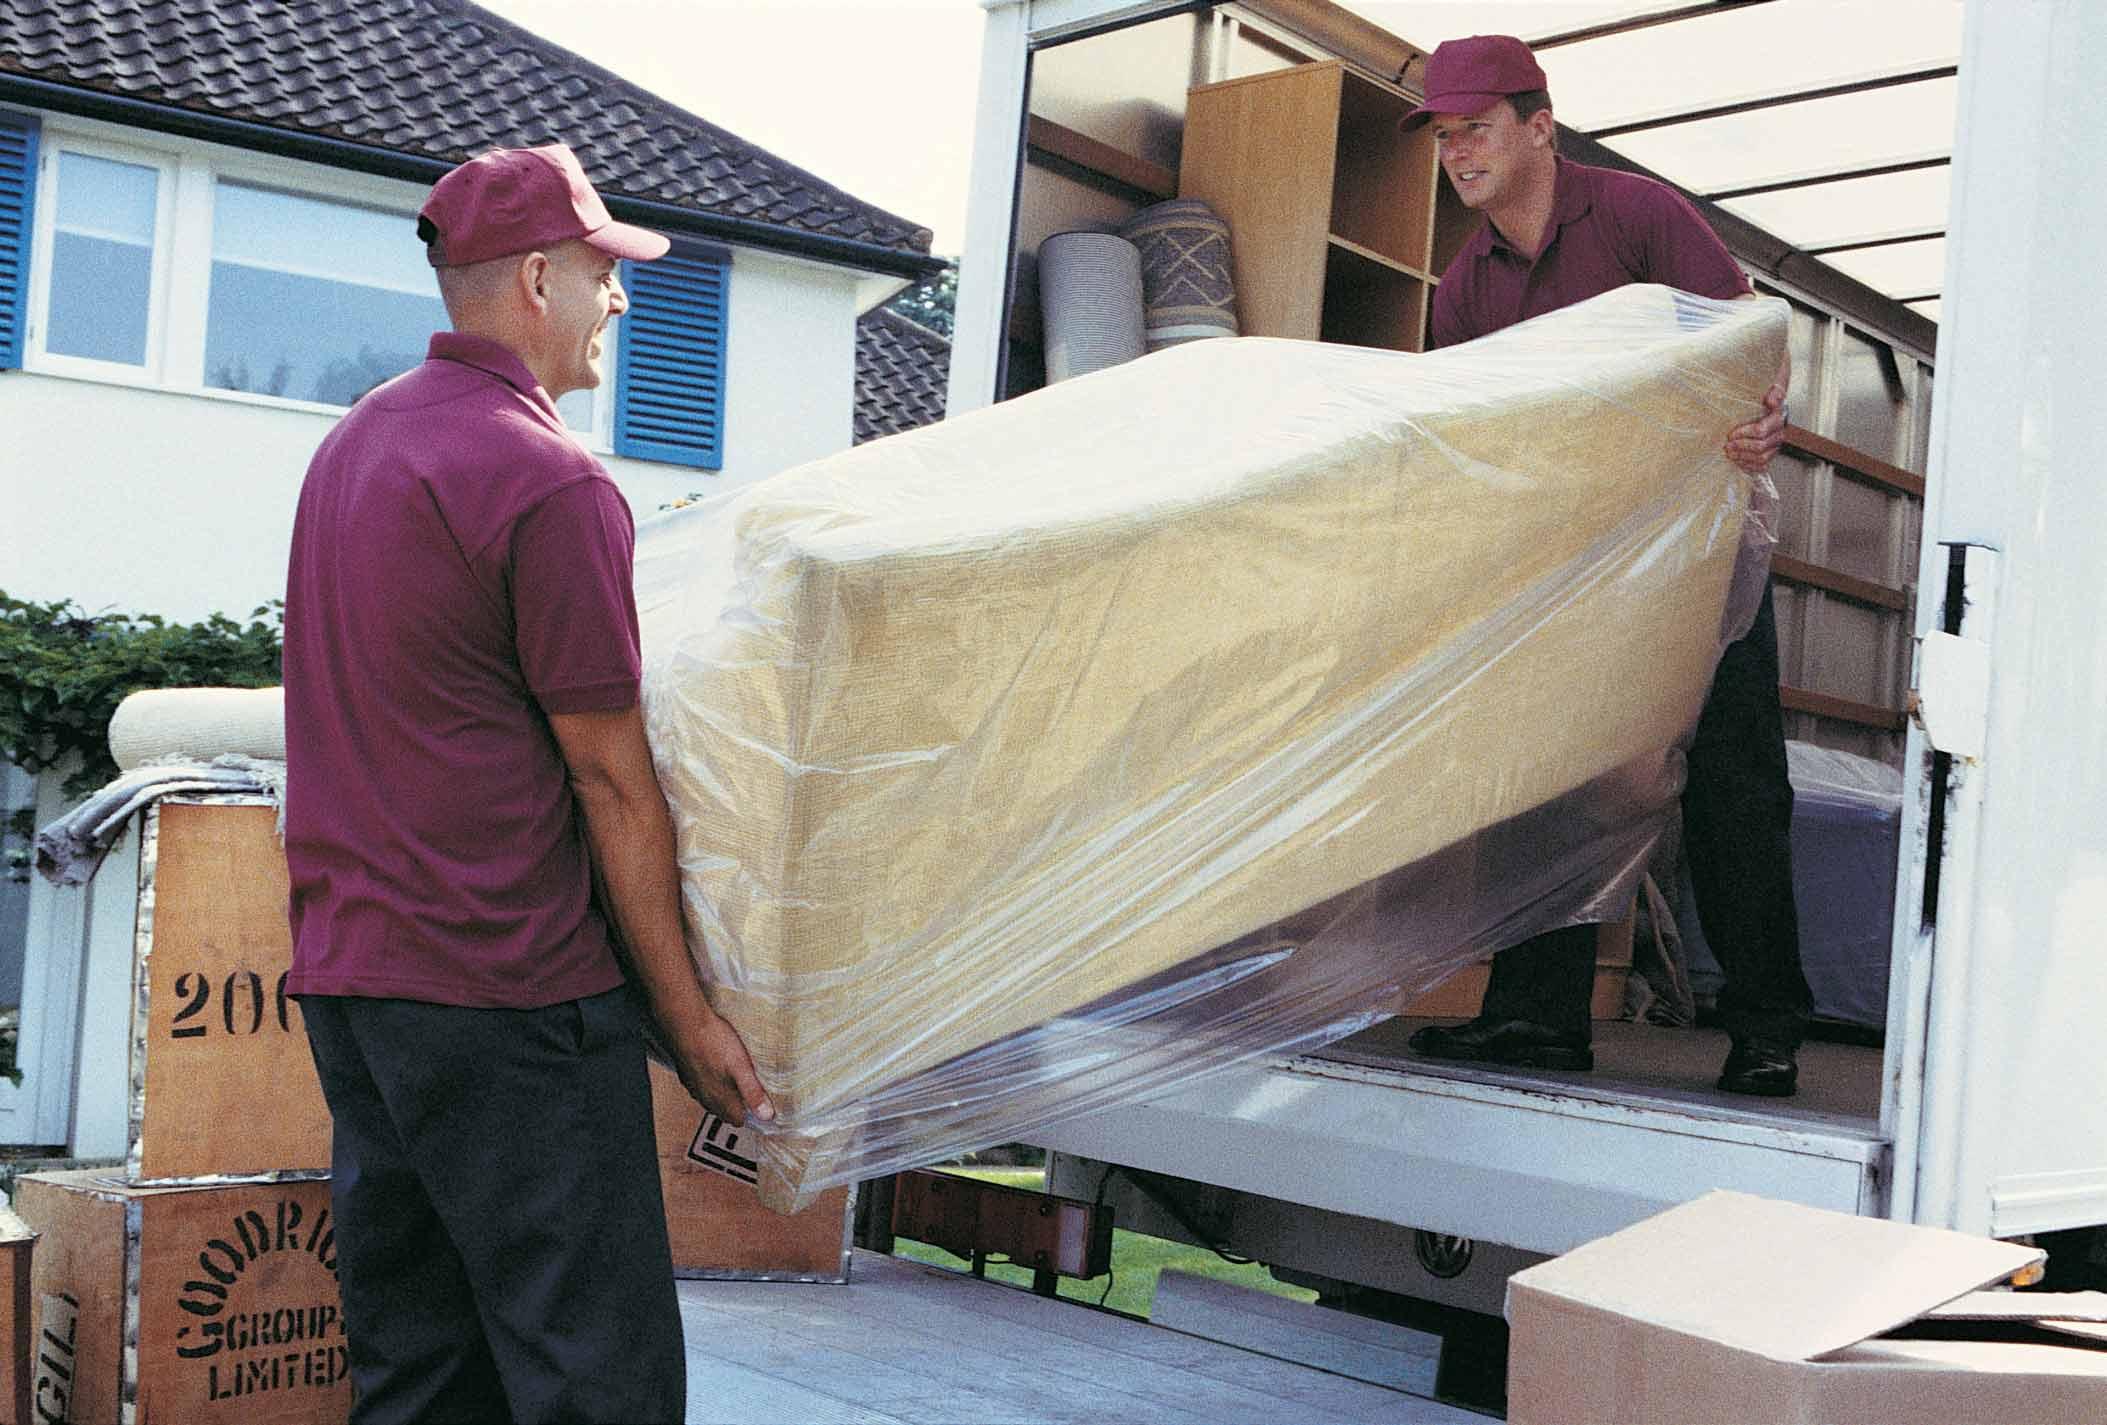 unloading-truck